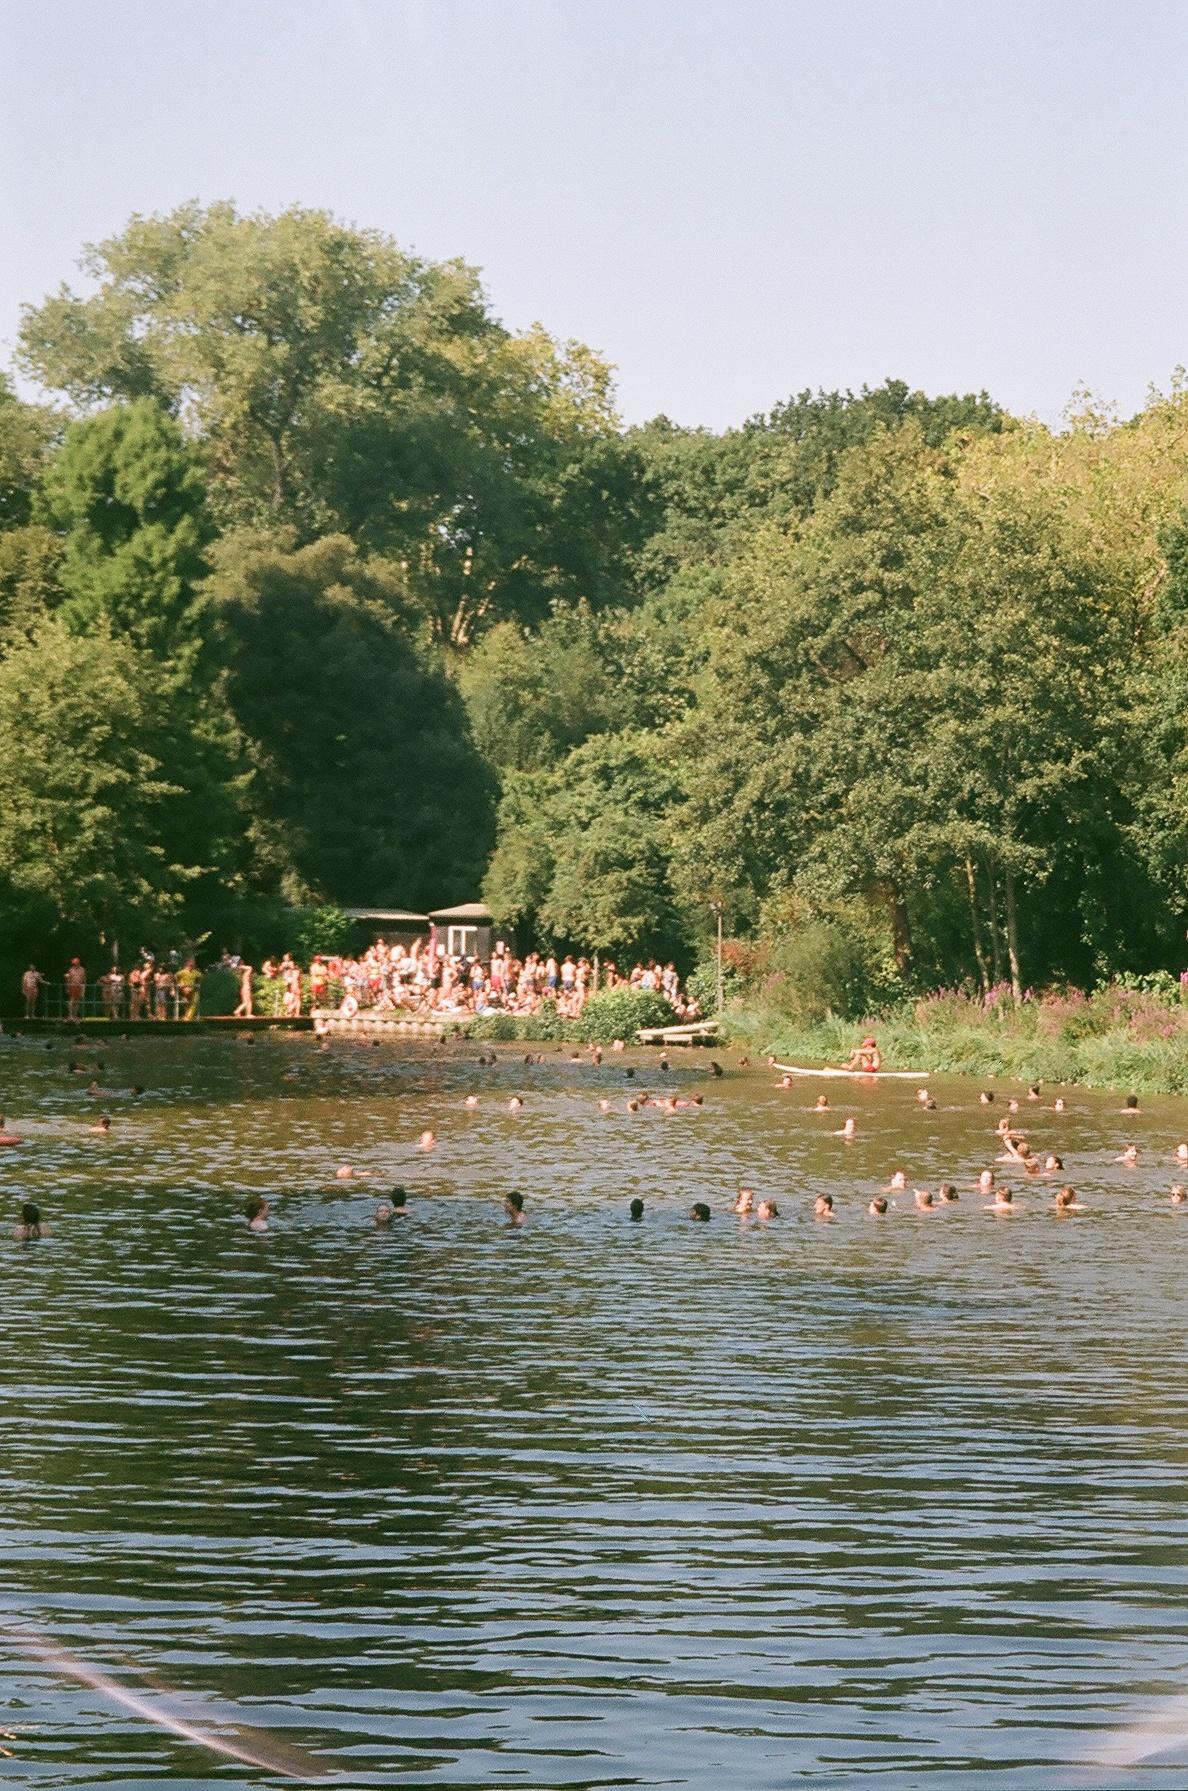 Hampstead Heath Ponds. I still have never swam in here, it freaks me out that I can't see the bottom.  / O lago de Hampstead Heath. Nunca fui capaz de lá nadar, faz-me confusão não conseguir ver o fundo.